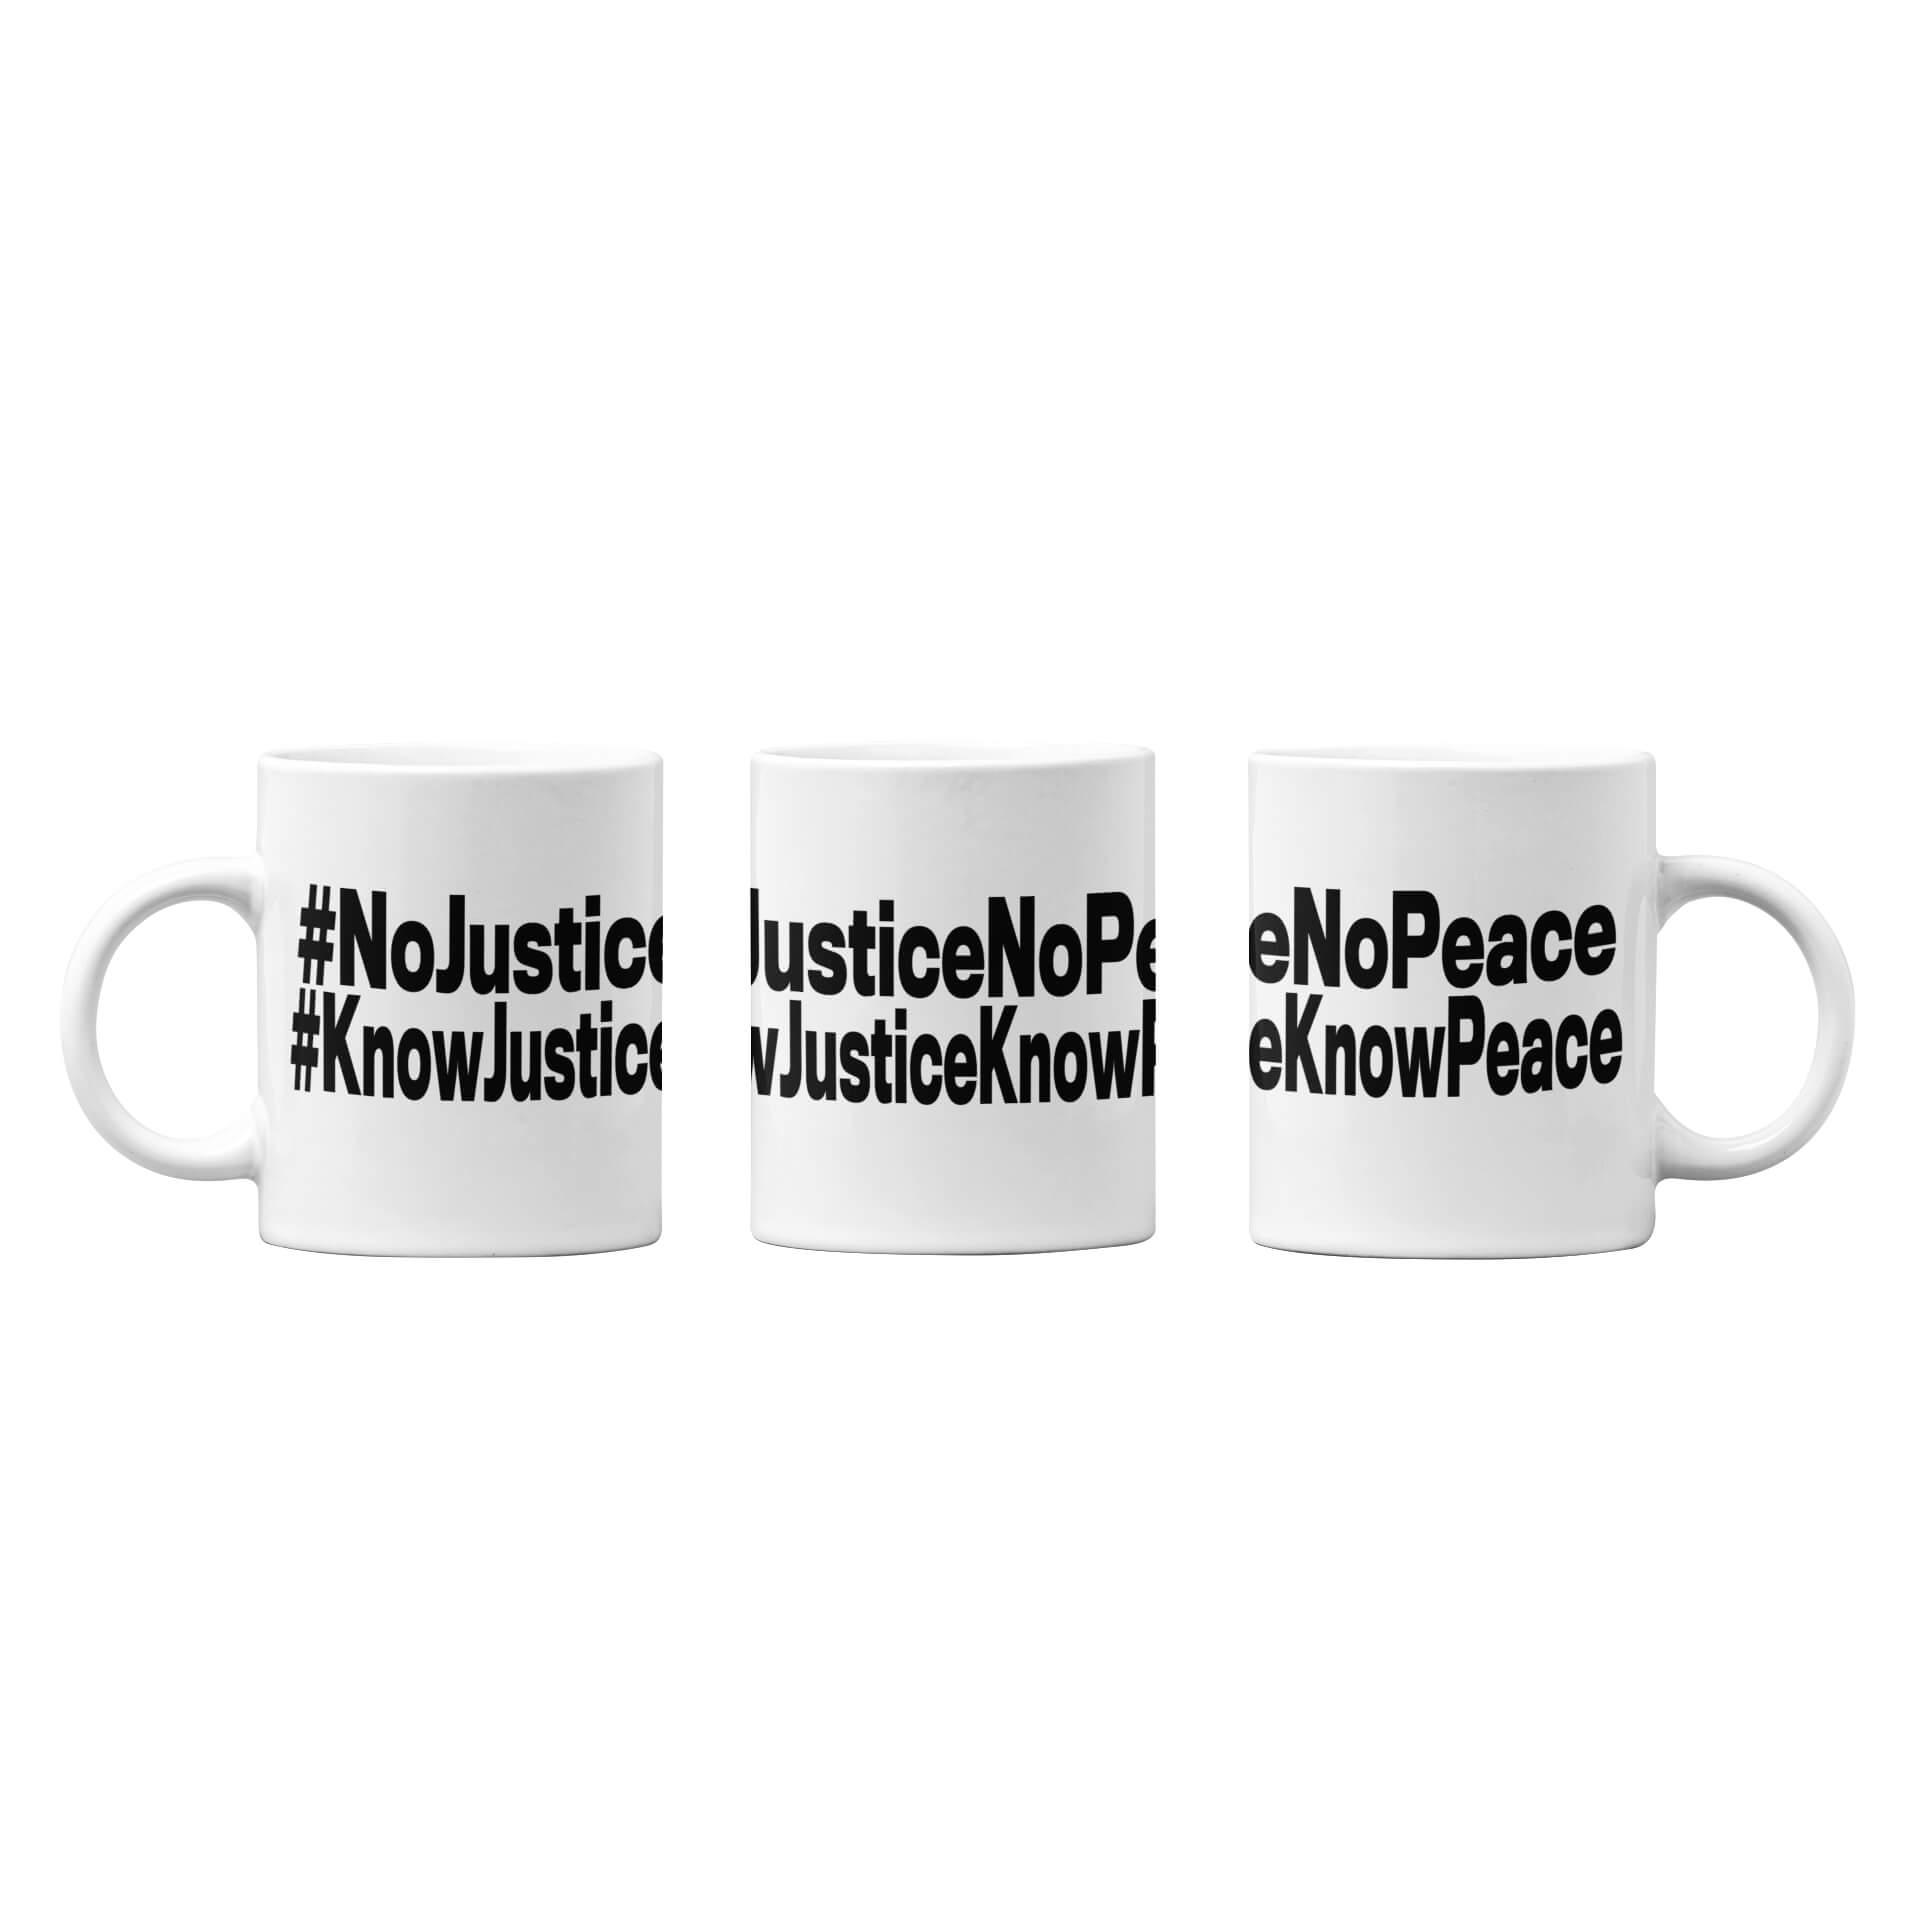 No Justice No Peace - Know Justice Know Peace Mug